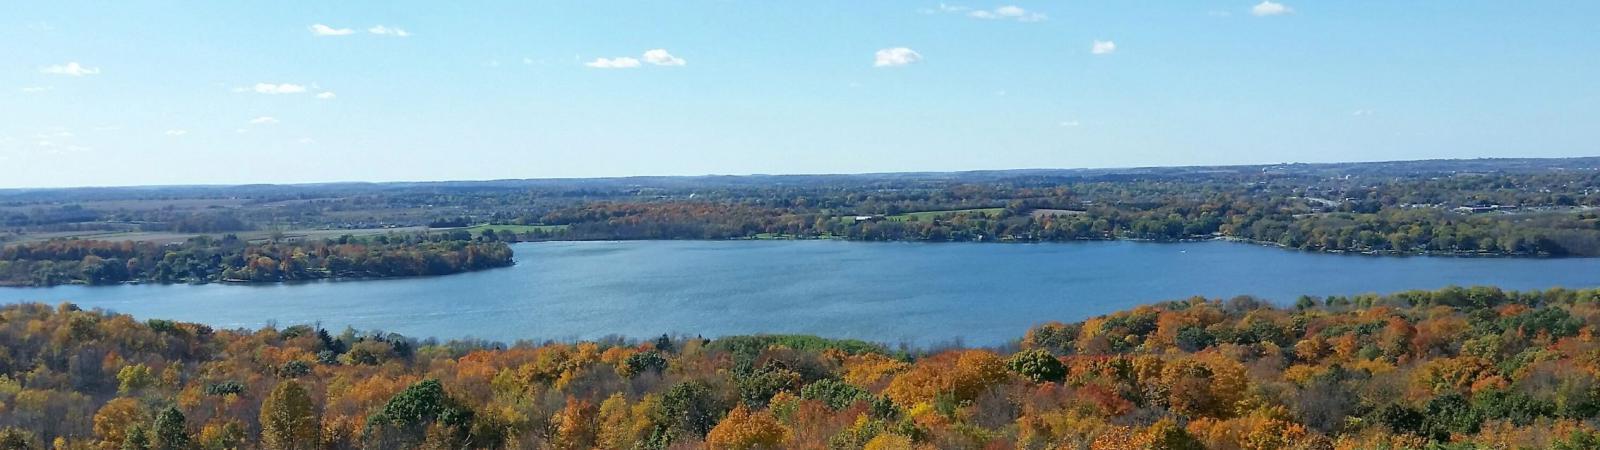 Hartford landscape with lake in background